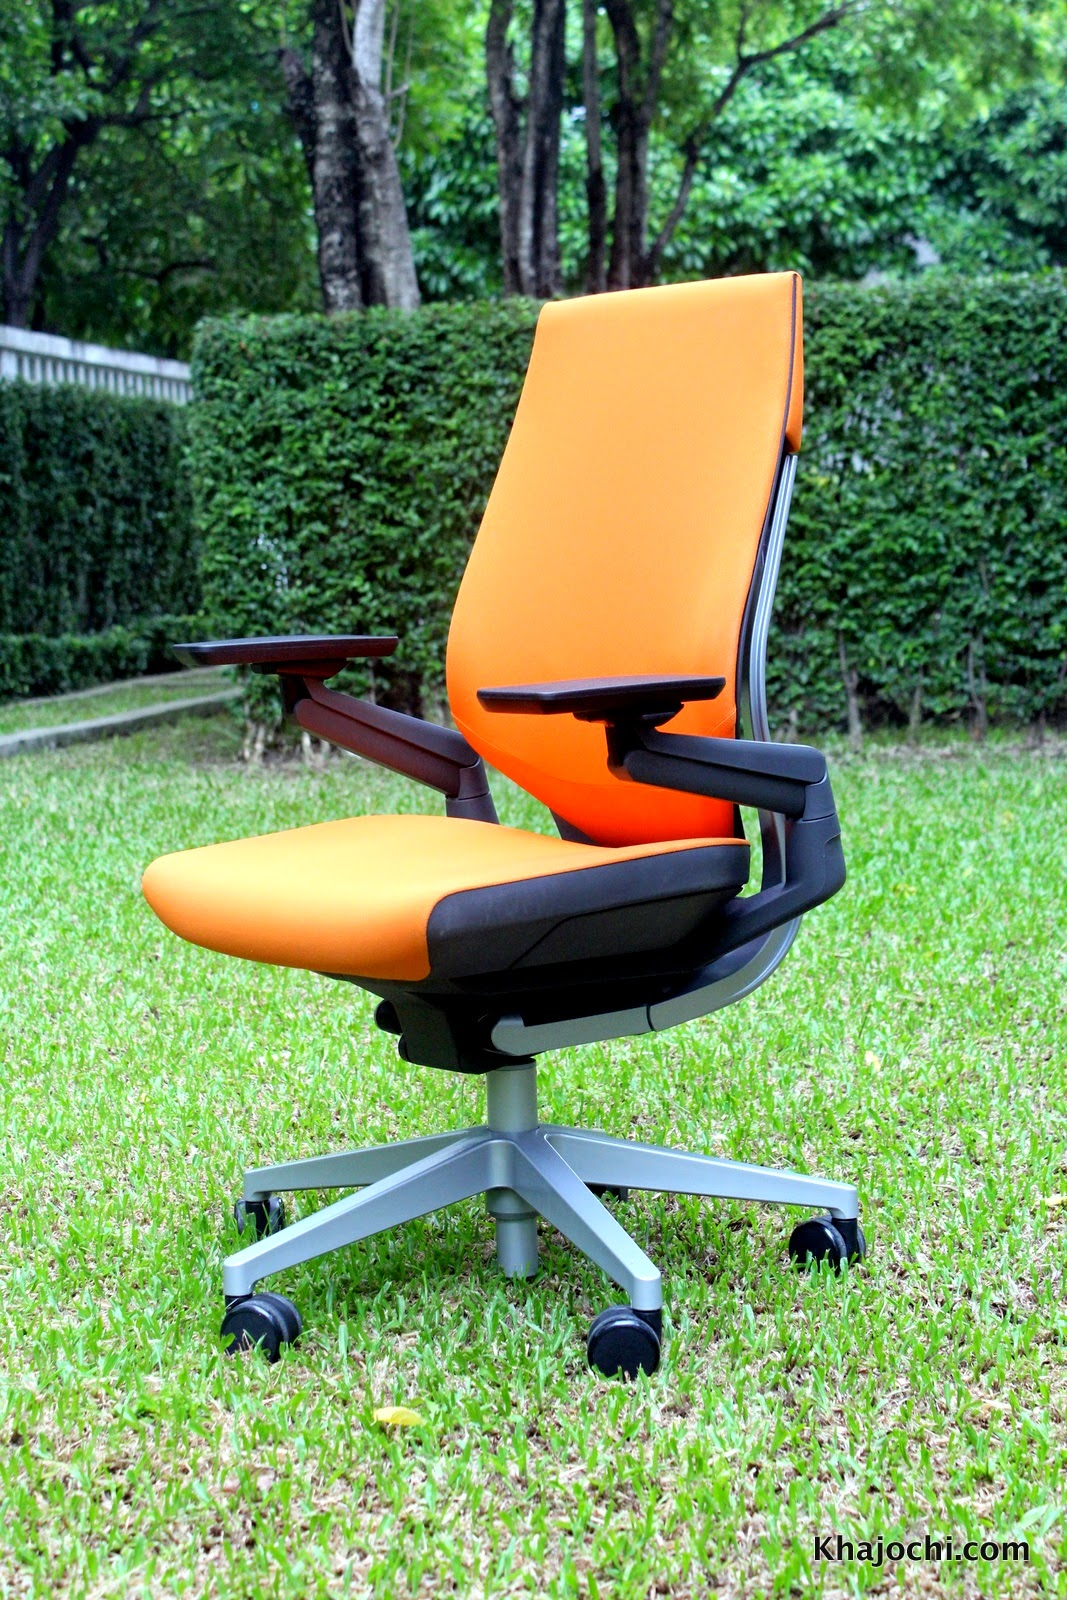 Steelcase Gesture Chair Review Office Posture Helper รวว จาก Modernform เกาอทออกแบบมาเพอยค